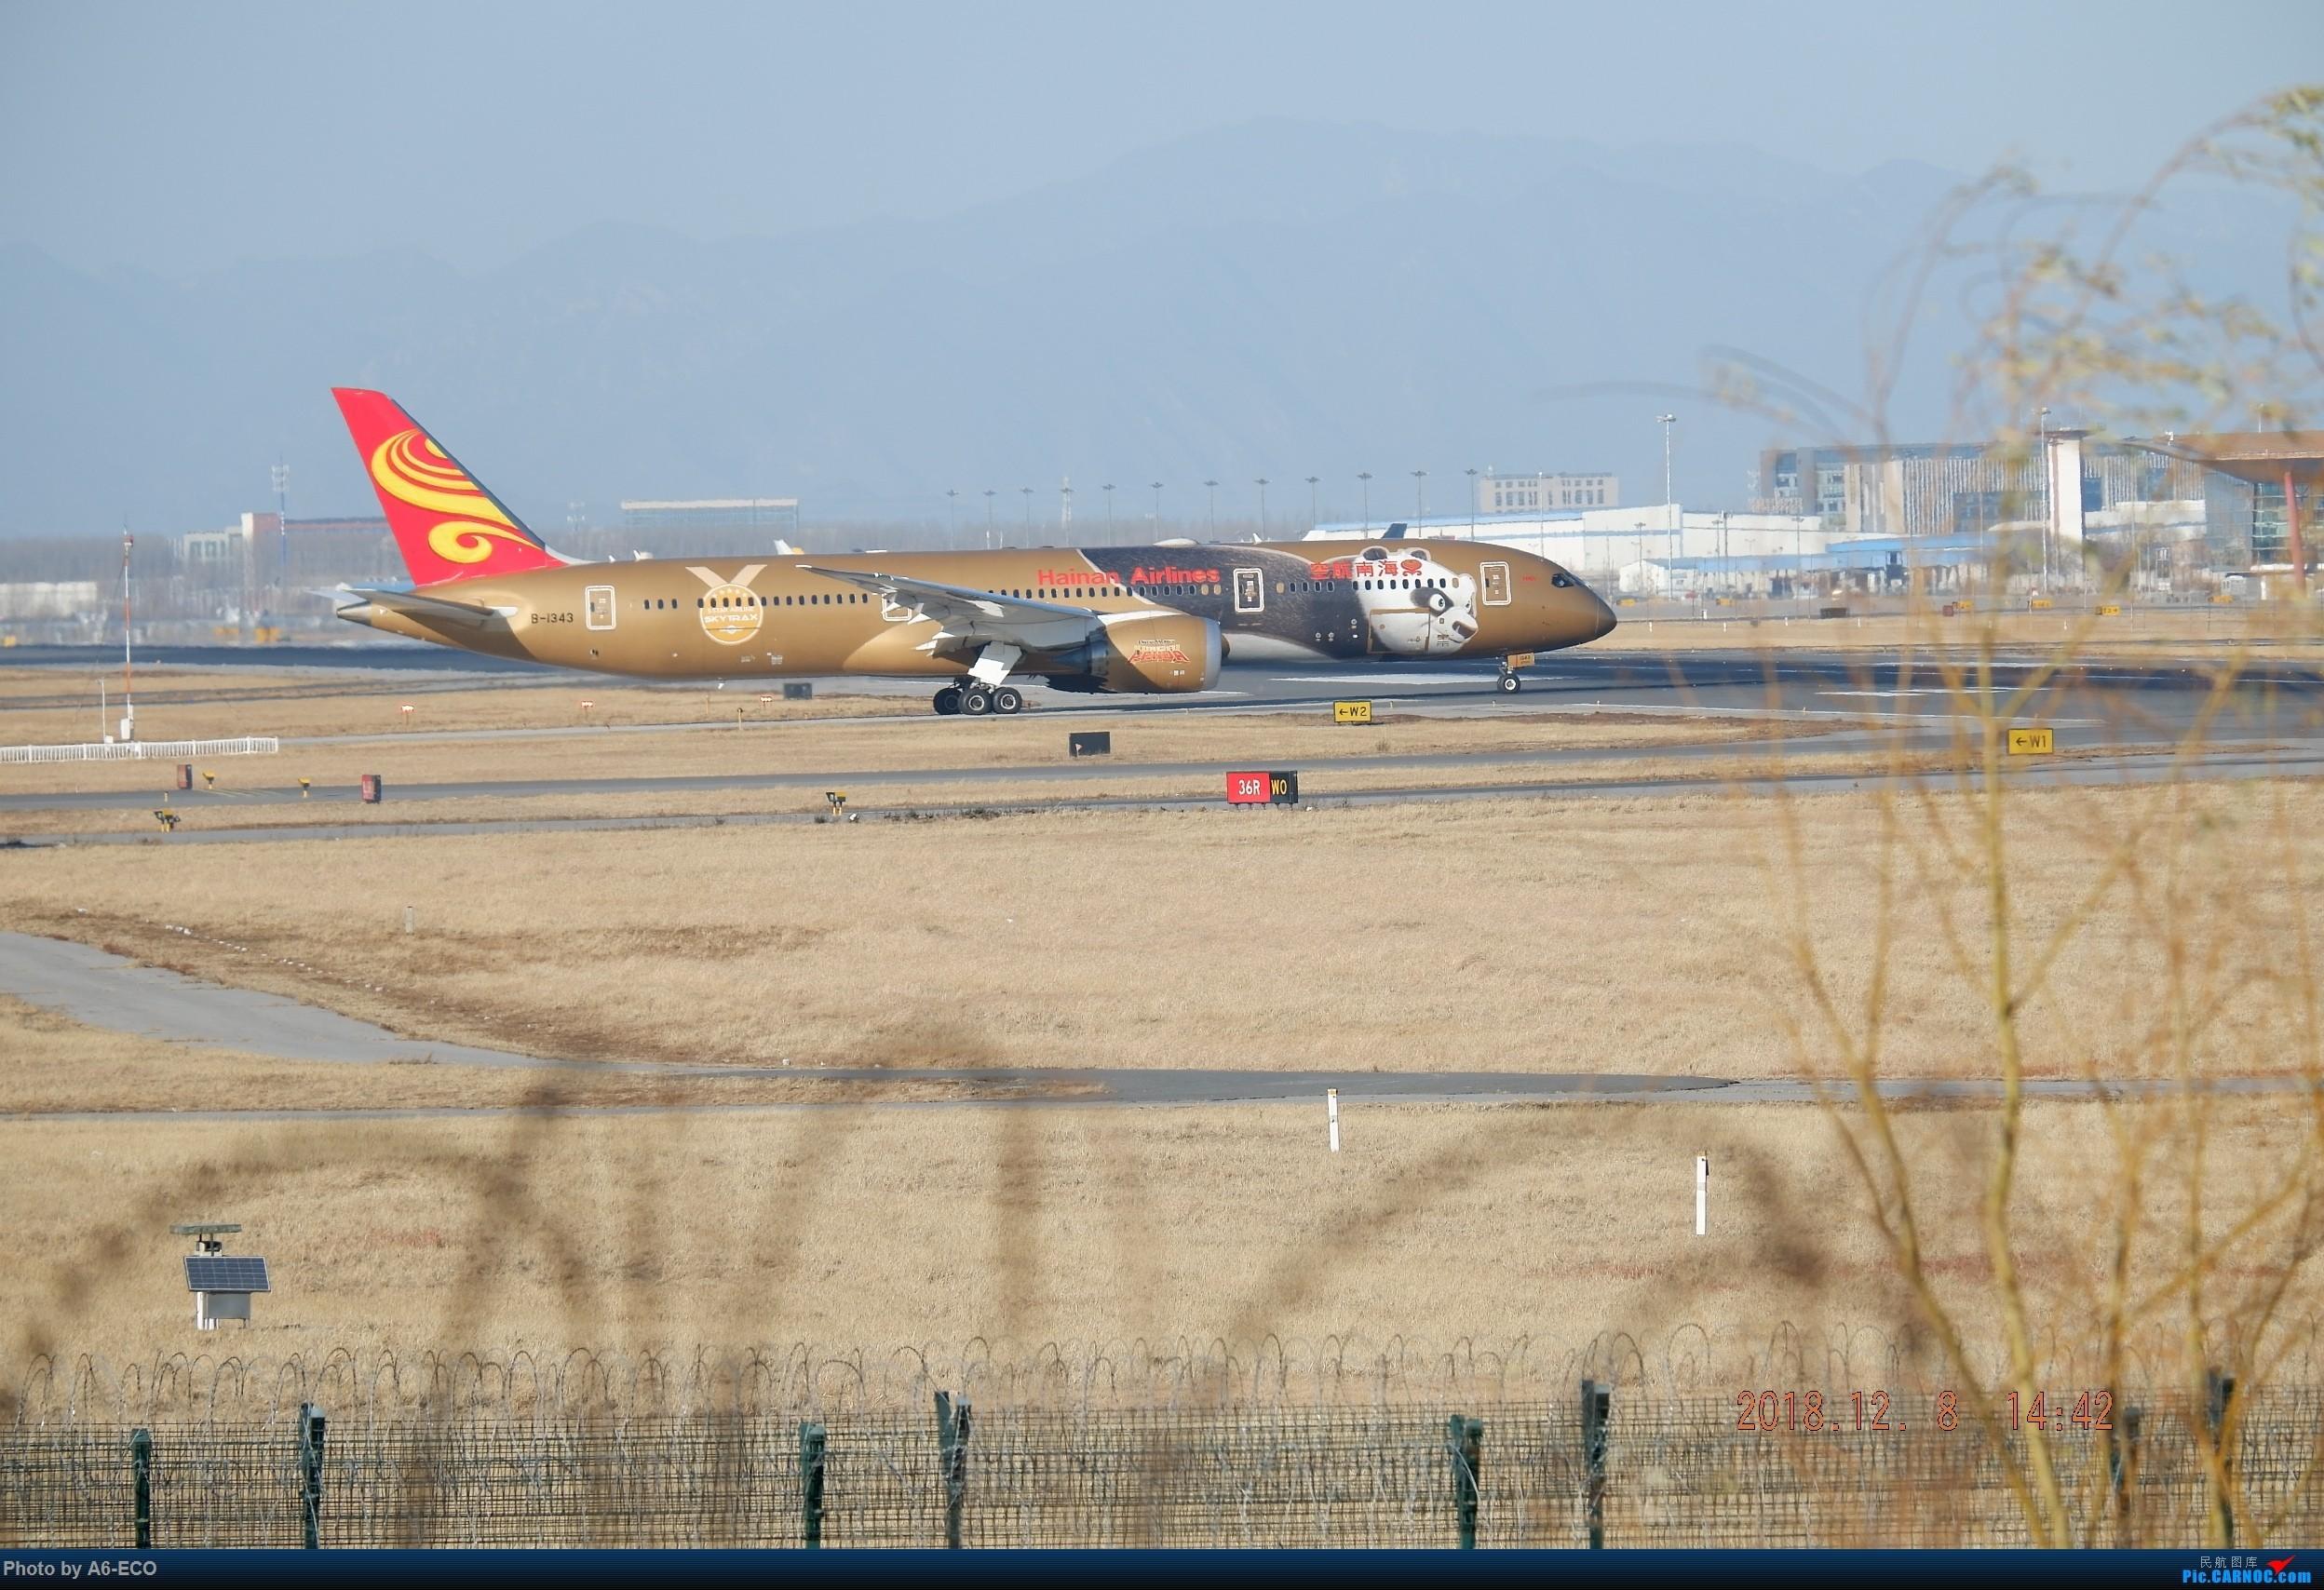 Re:[原创]波音787首飞九周年发图祝贺一下 BOEING 787-9 B-1343 中国北京首都国际机场